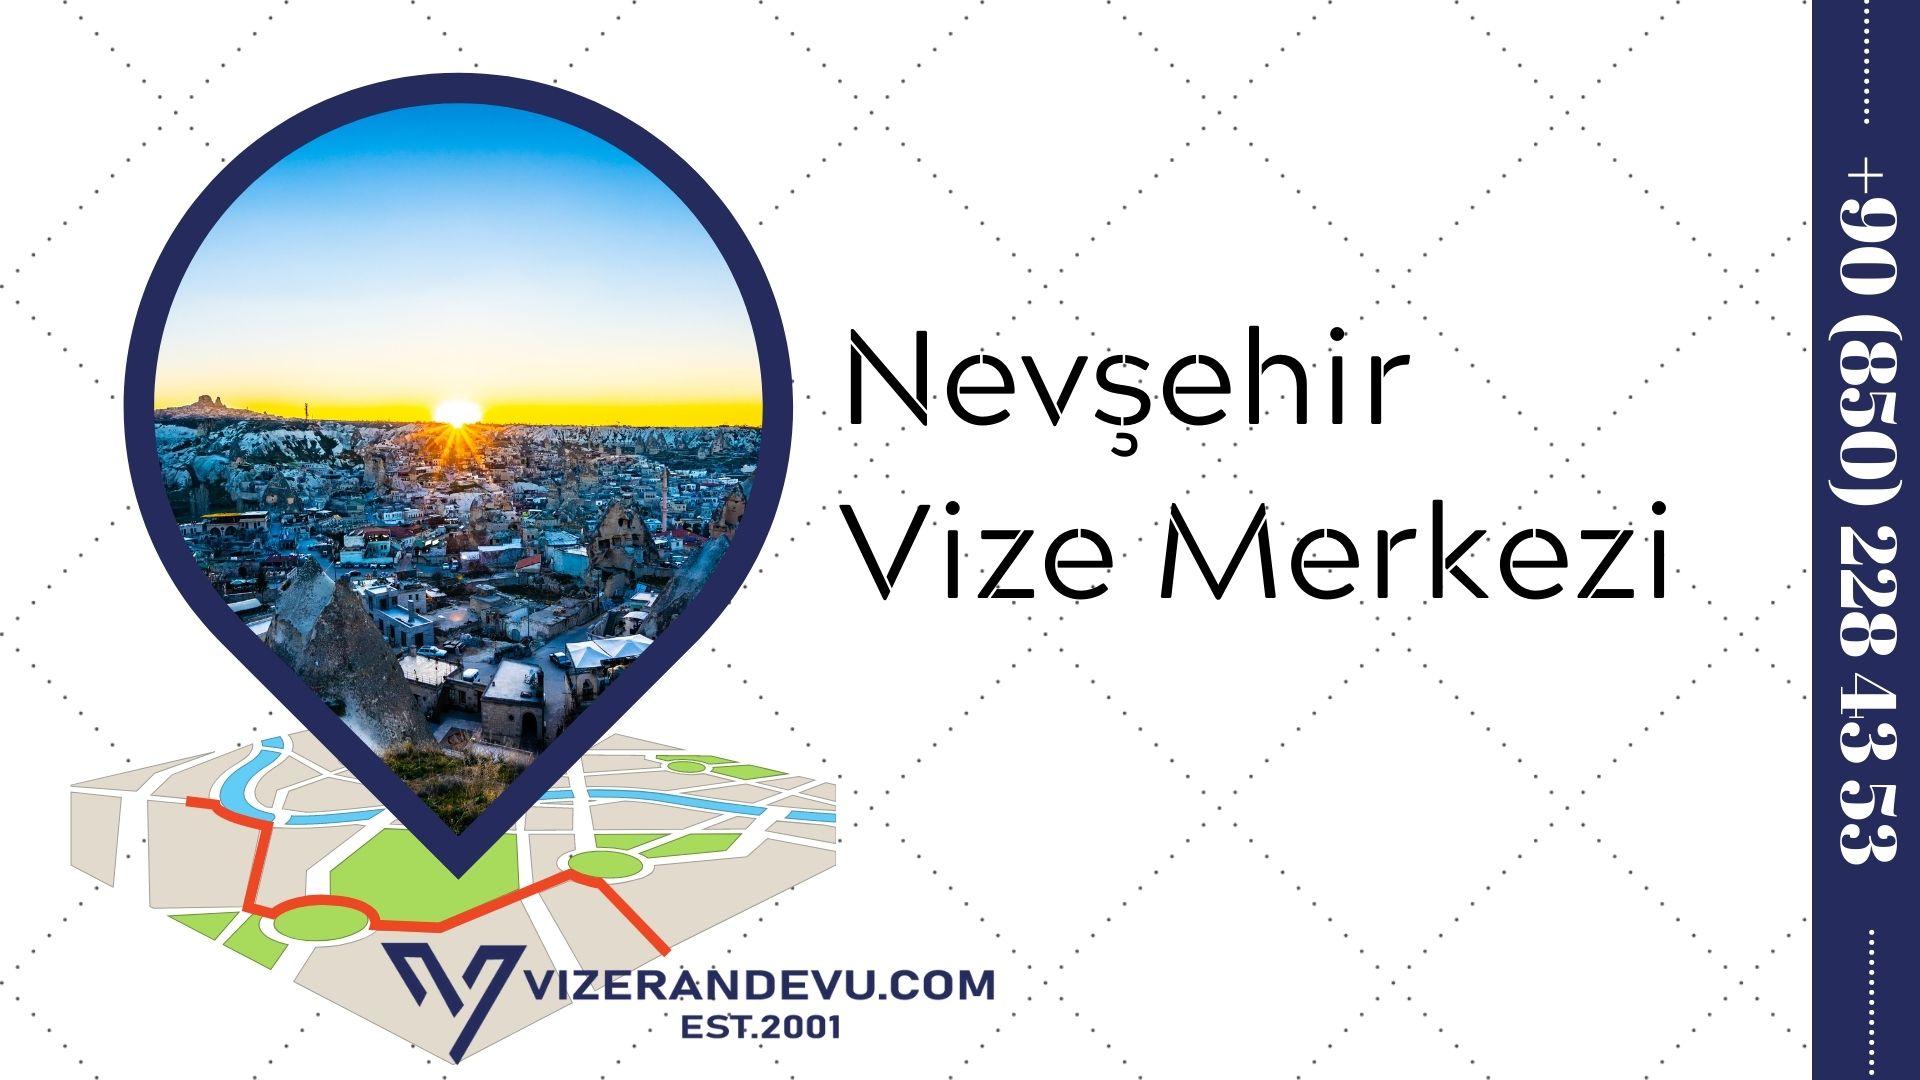 Nevşehir Vize Merkezi